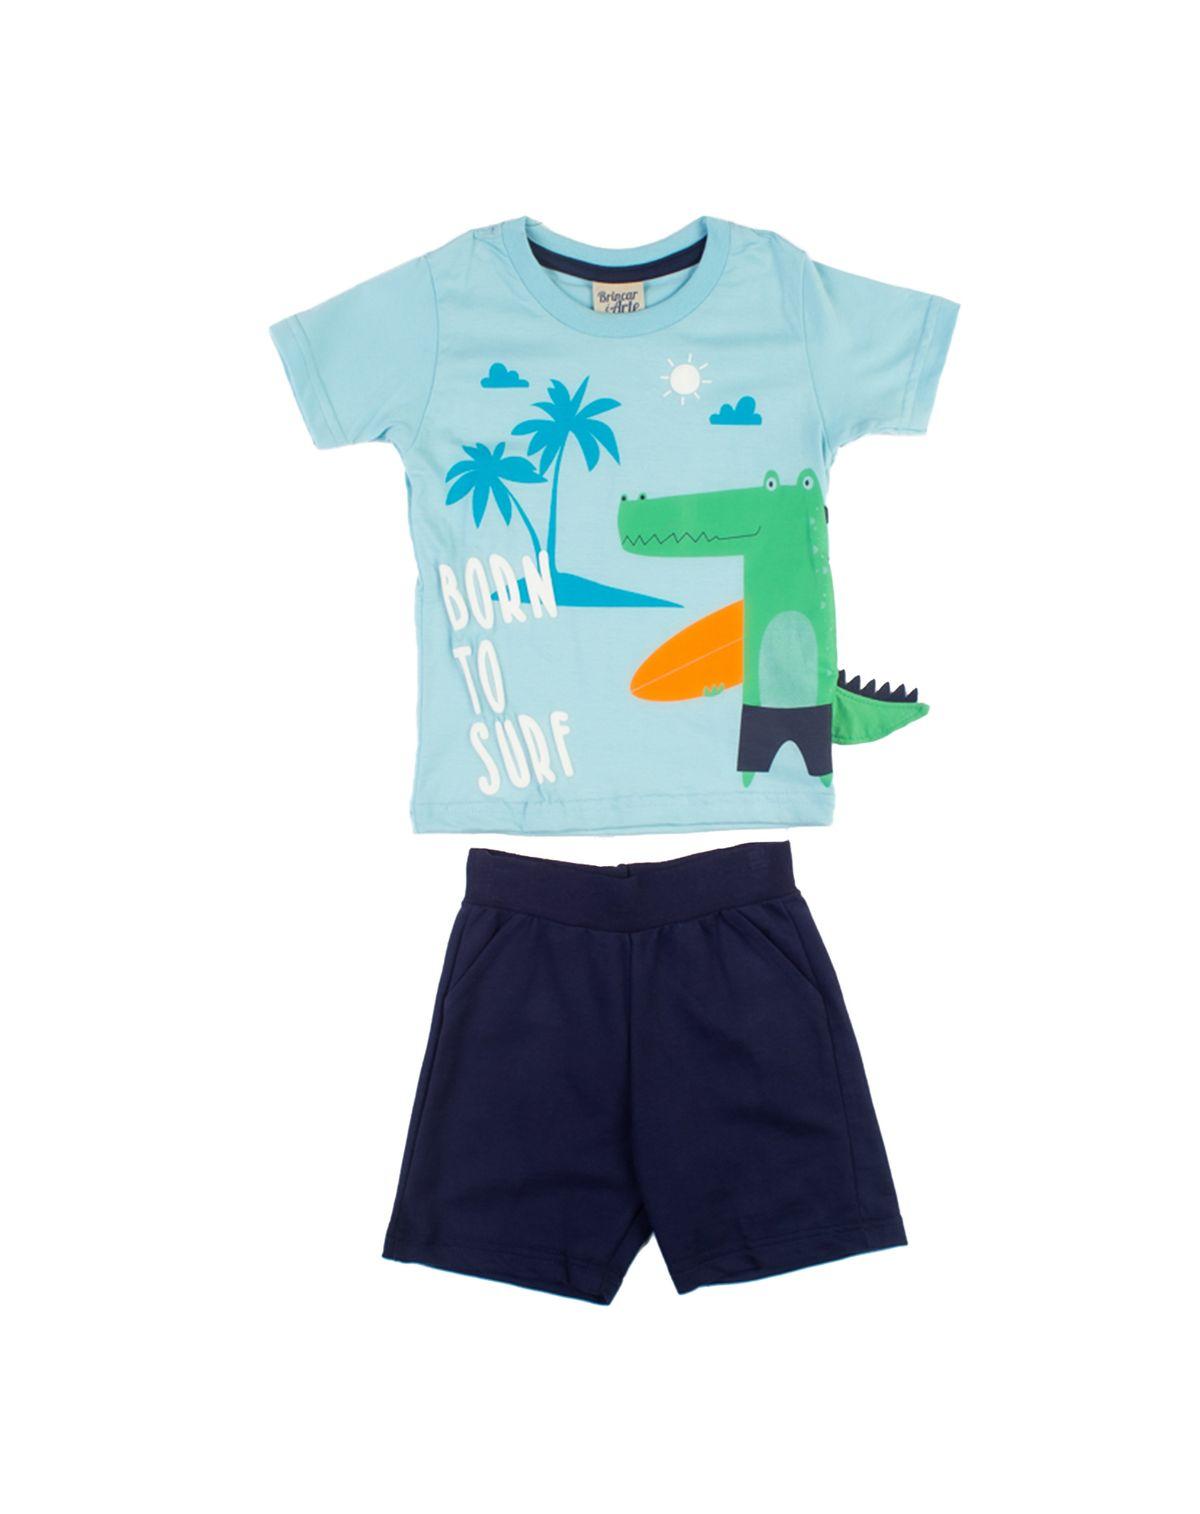 538550001-conjunto-curto-bebe-menino-estampa-interativa-jacare-marinho-3-827